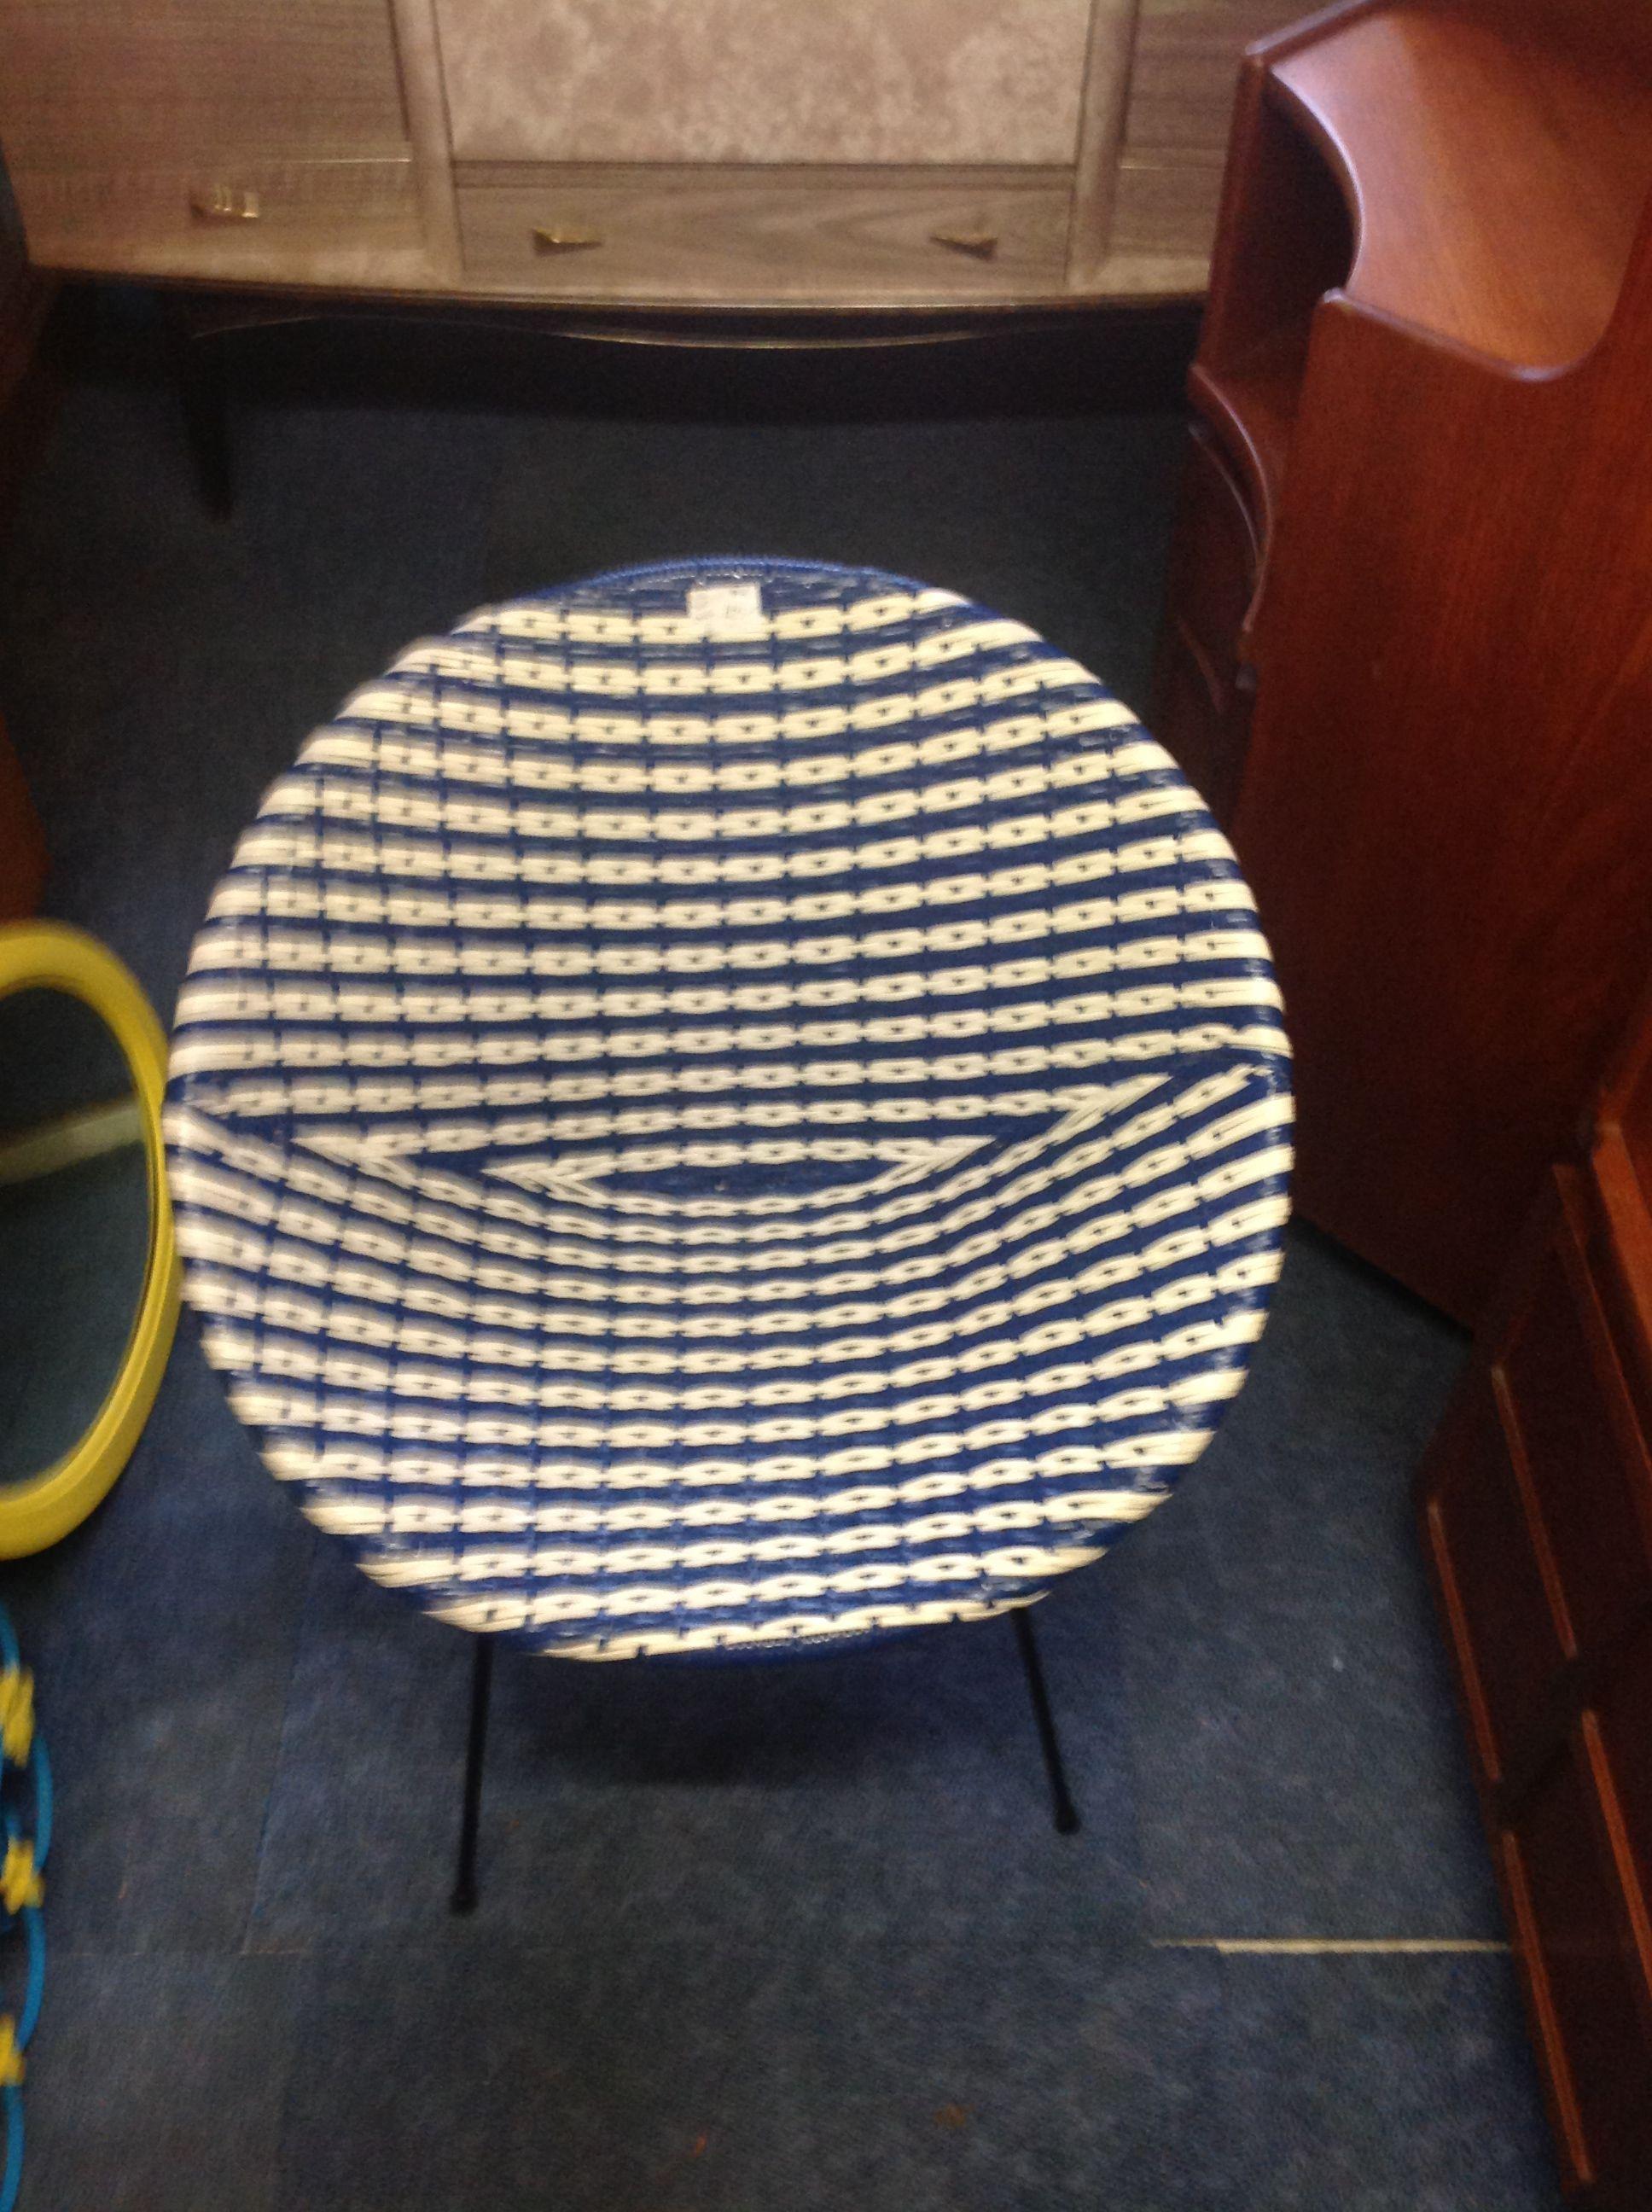 Funky Vinyl Basket Weave Chair 1960u0027s Excellent Condition Buy From My  Generation Retro Furniture Battlesbridge Essex SS11 7RE £75.00